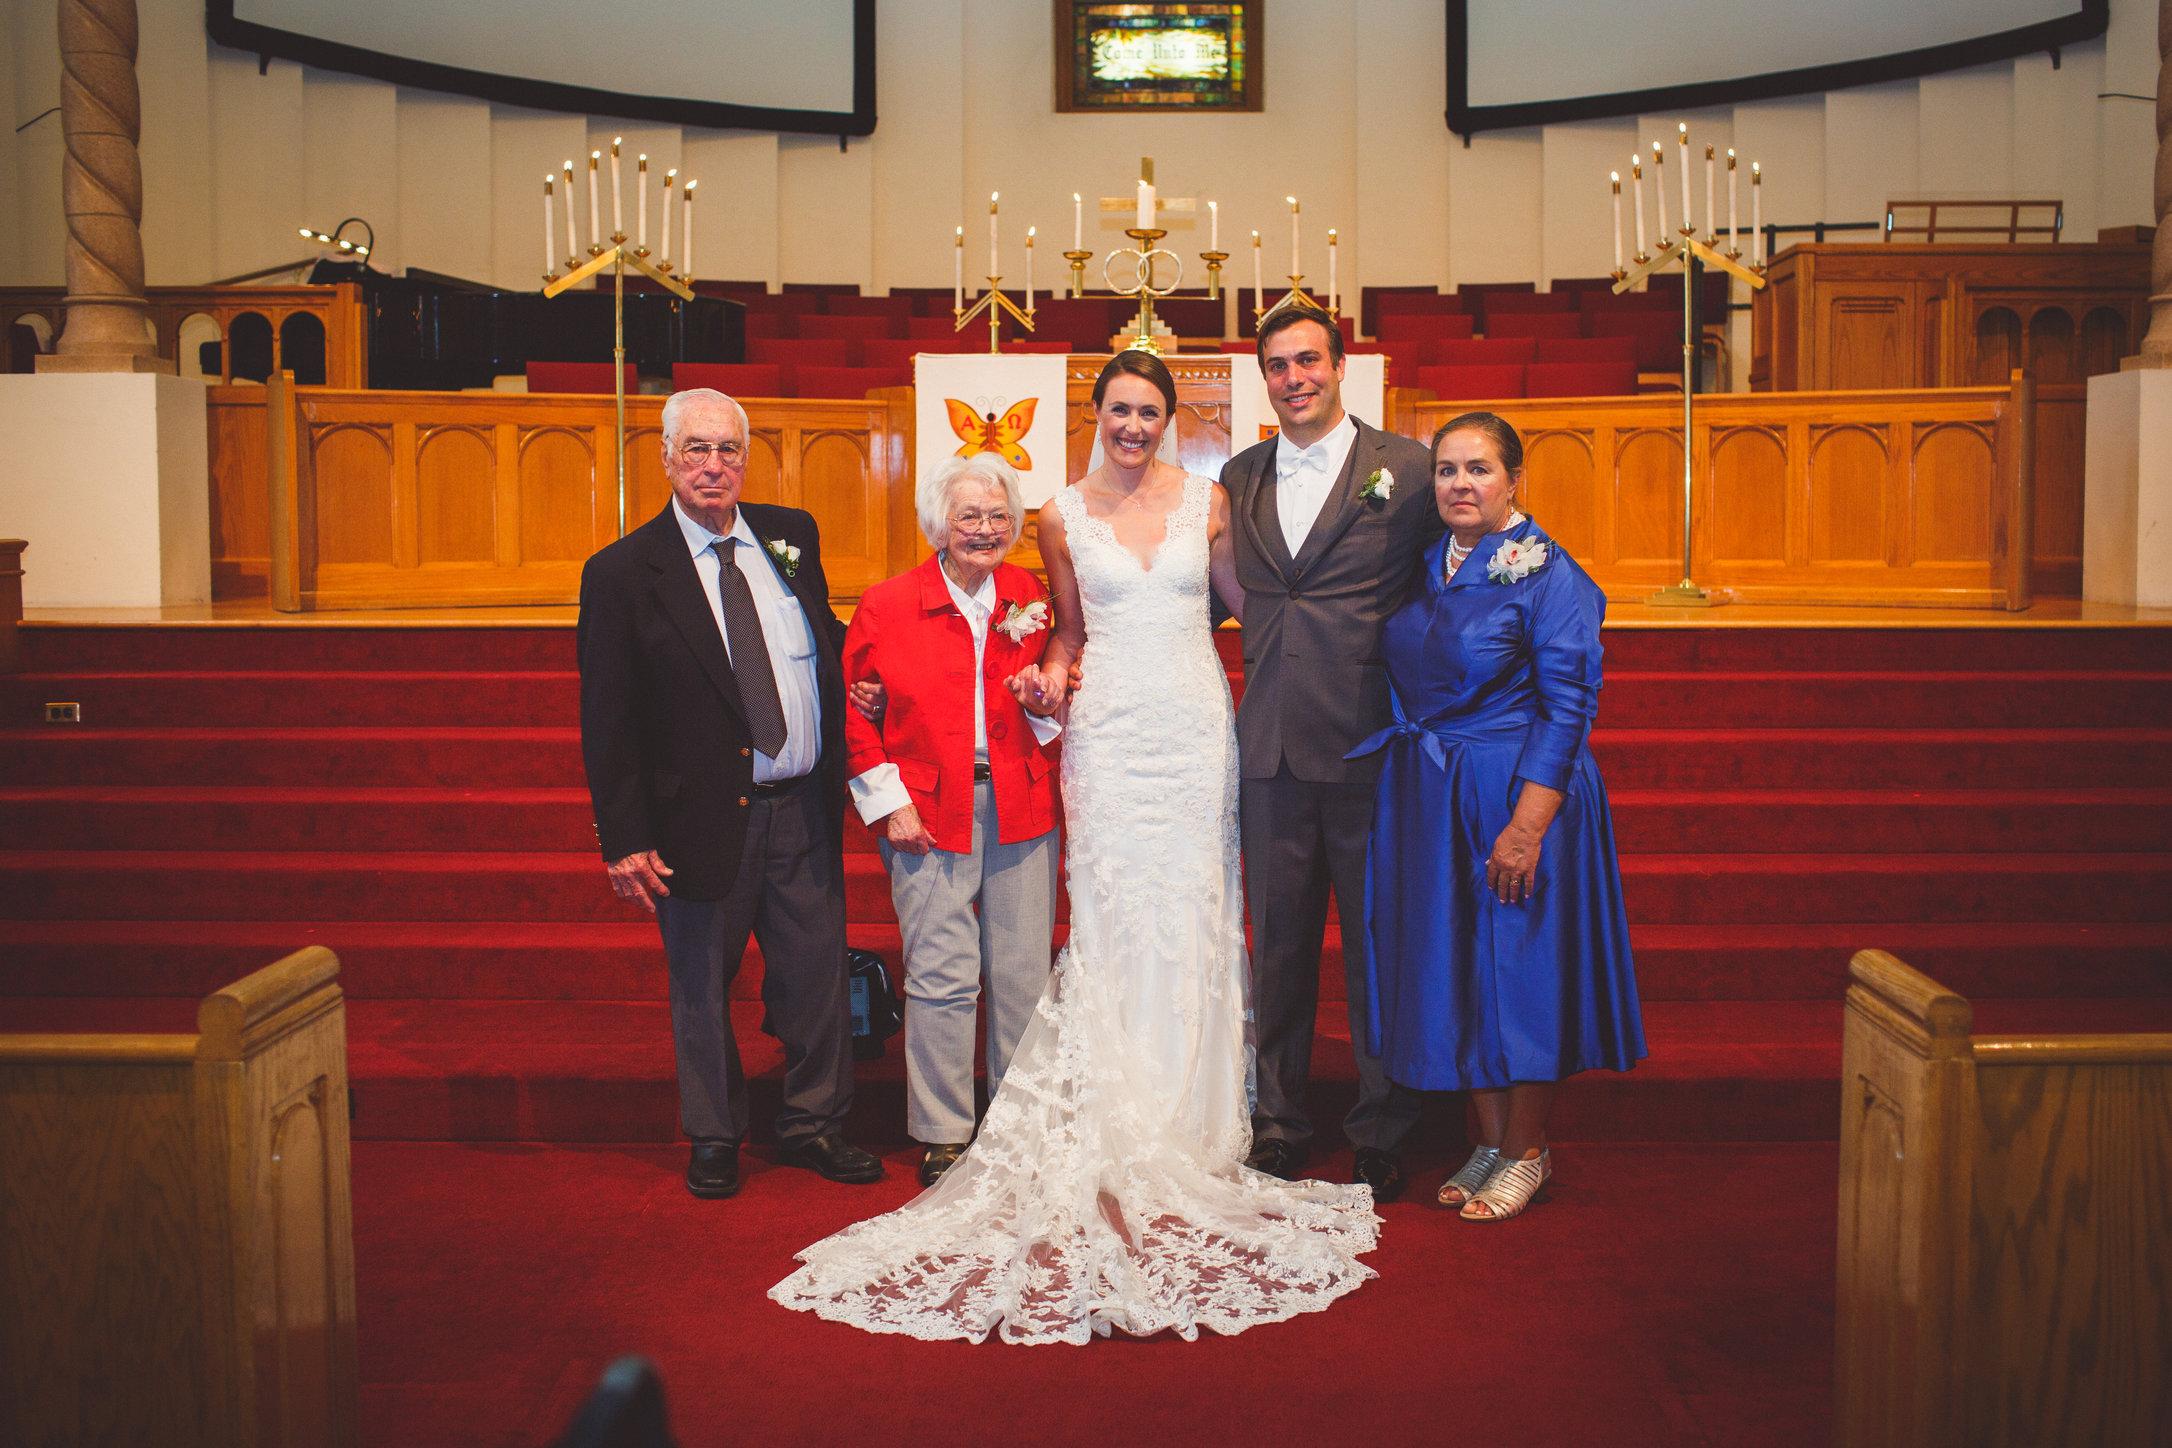 SandC-wedding-278.jpg